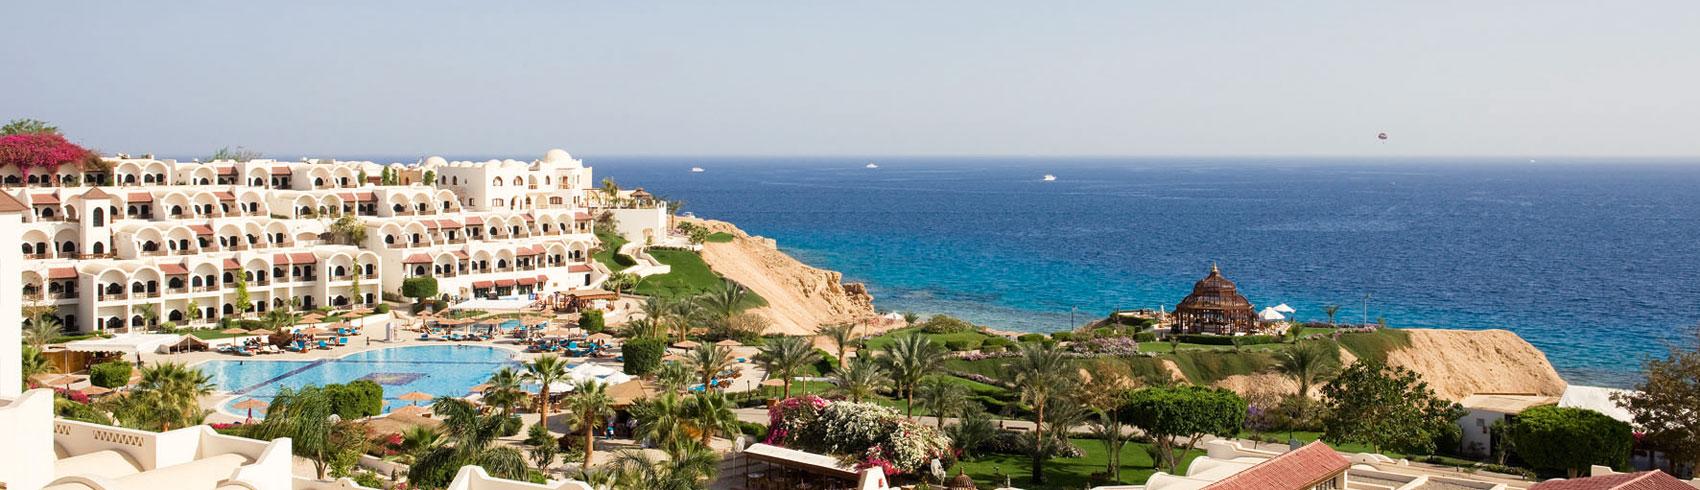 Moevenpick Resort Sharm El Sheikh image16